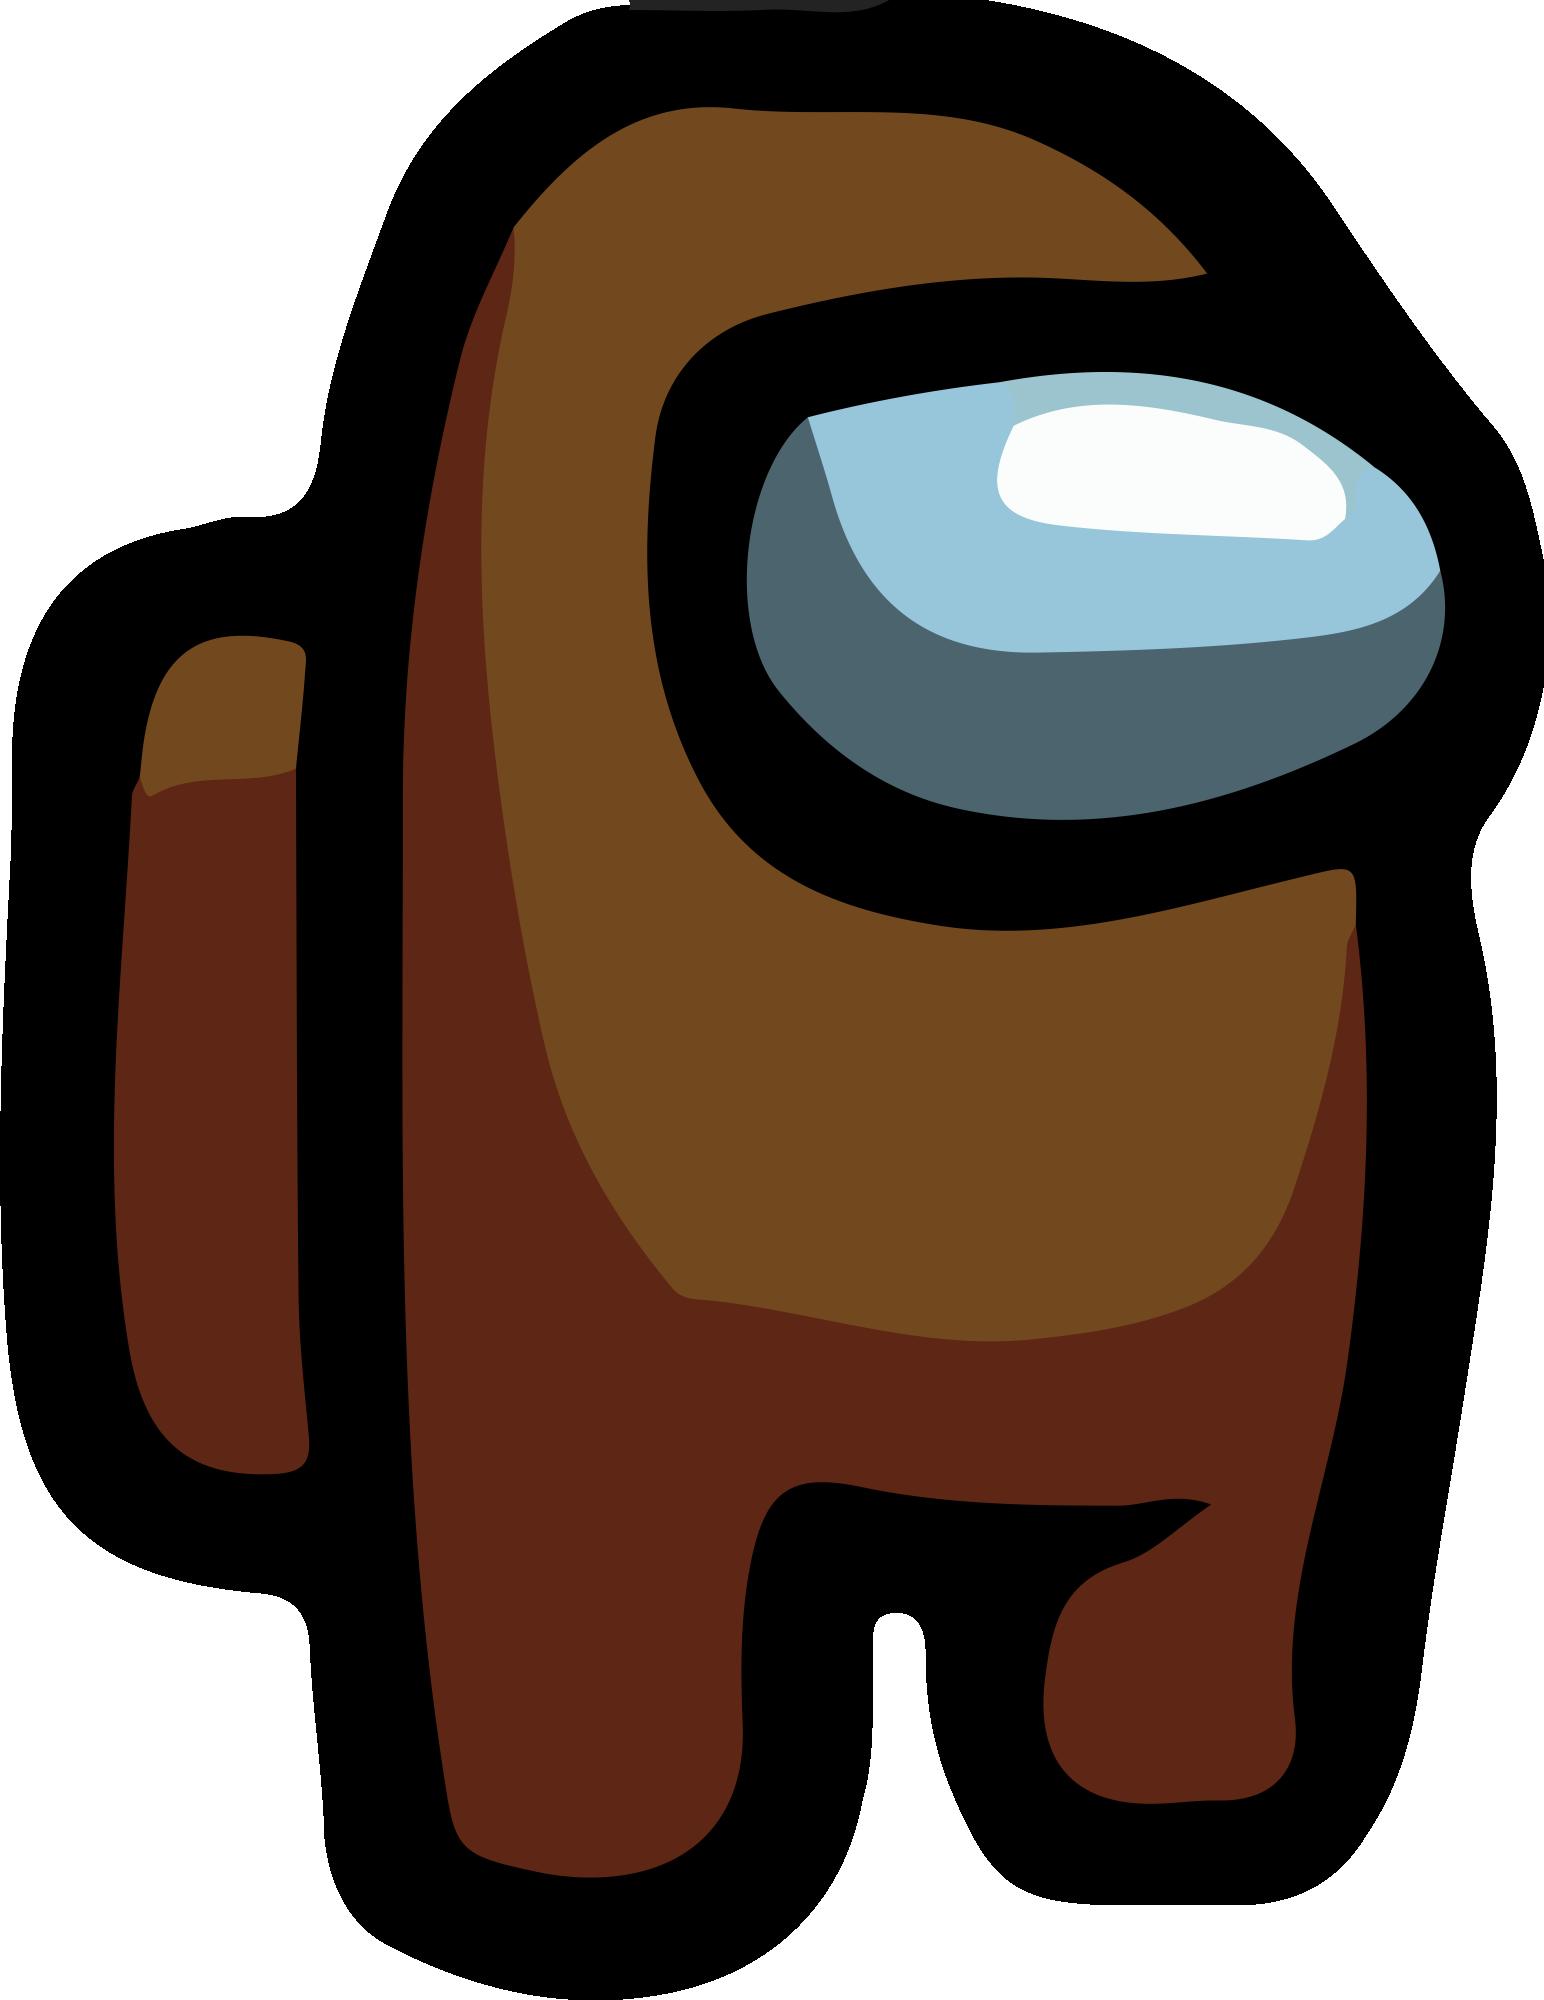 Among Us - Brown PNG 01 - Imagens PNG